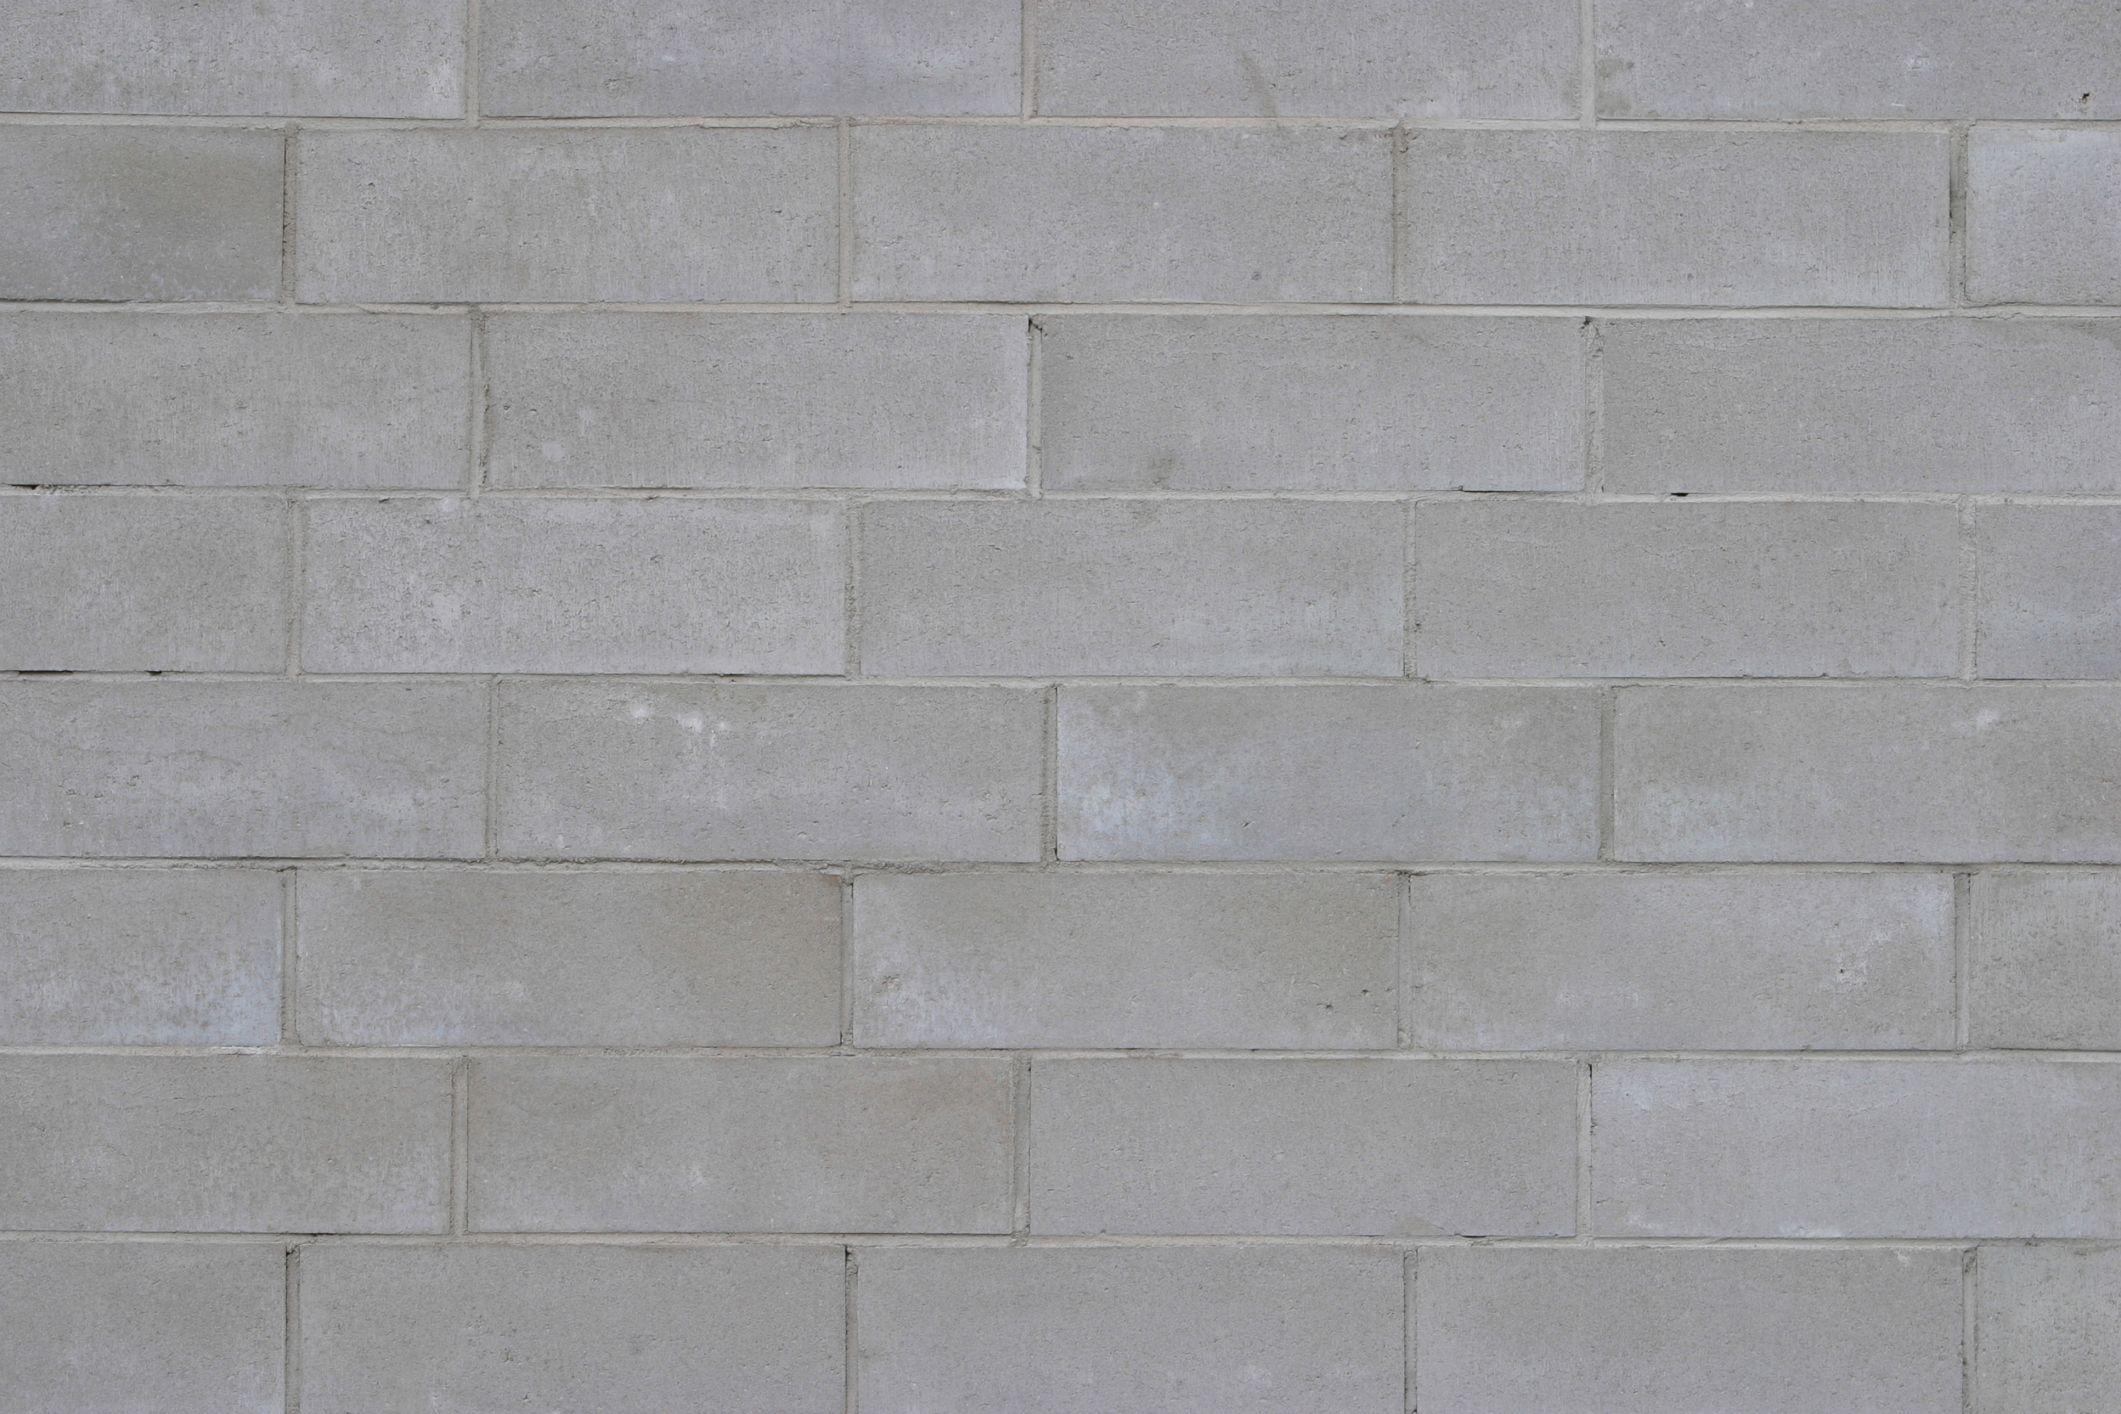 Bsd 106 Understanding Vapor Barriers Exterior Insulation Rigid Insulation Roof Cladding